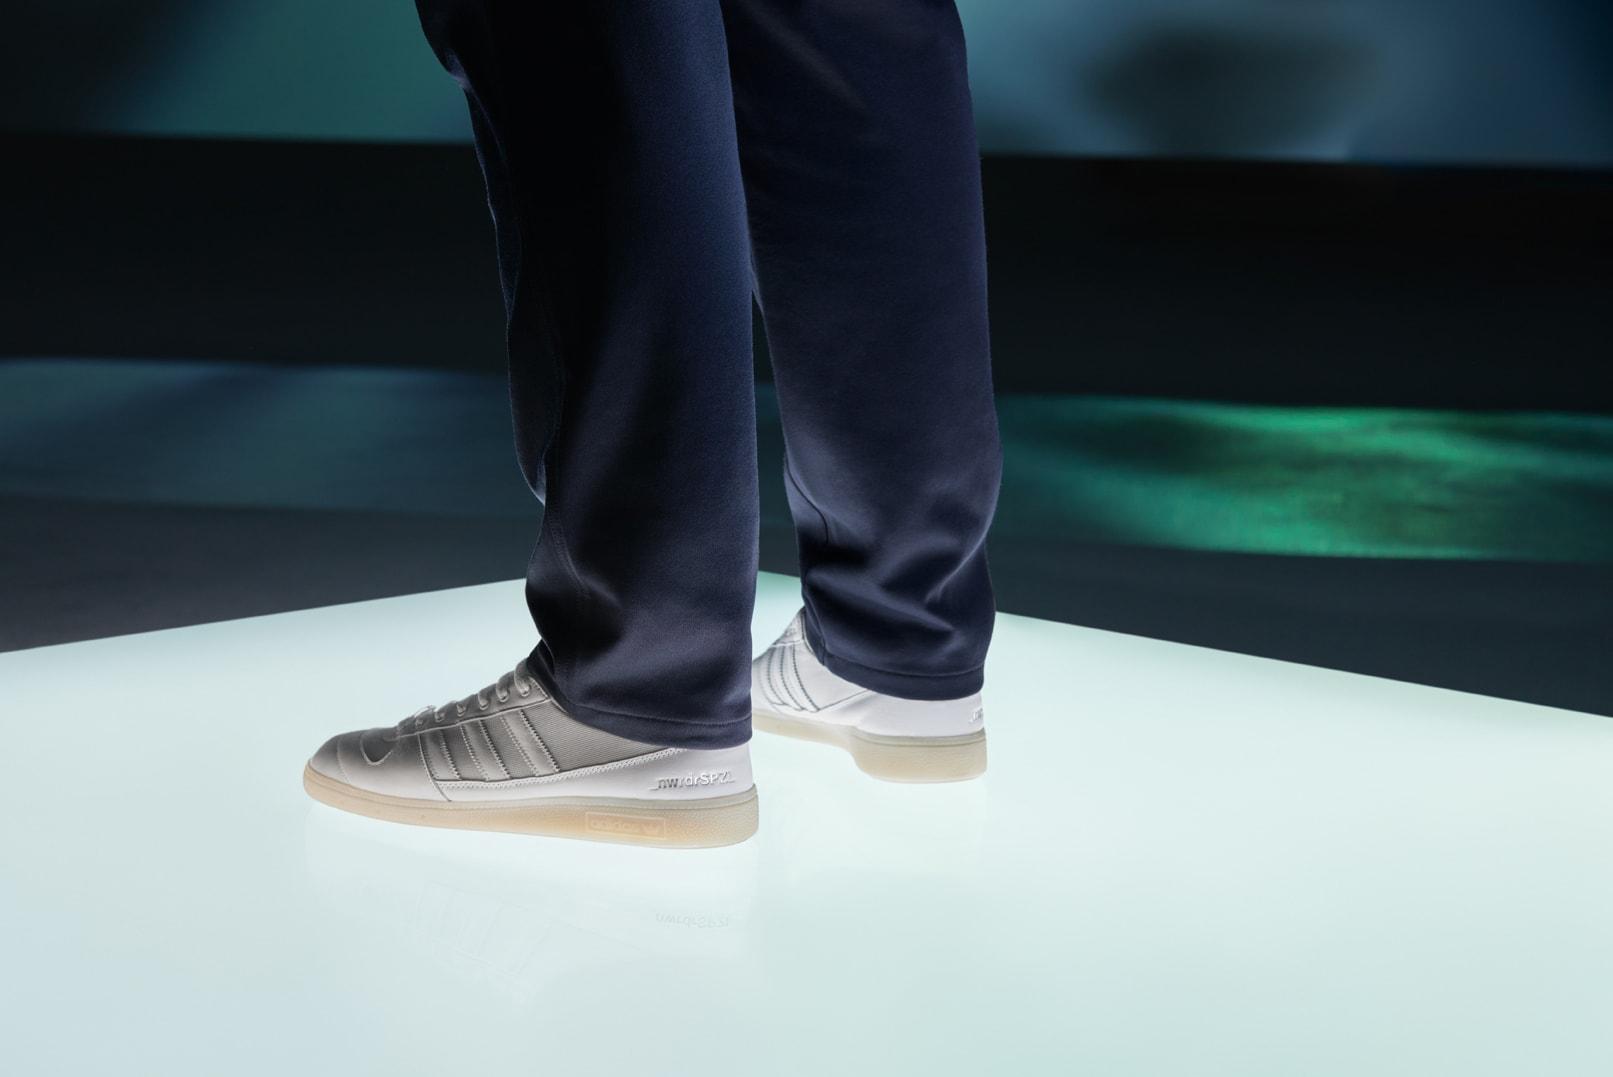 adidas New Order x SPZL Wilsy - FX1056